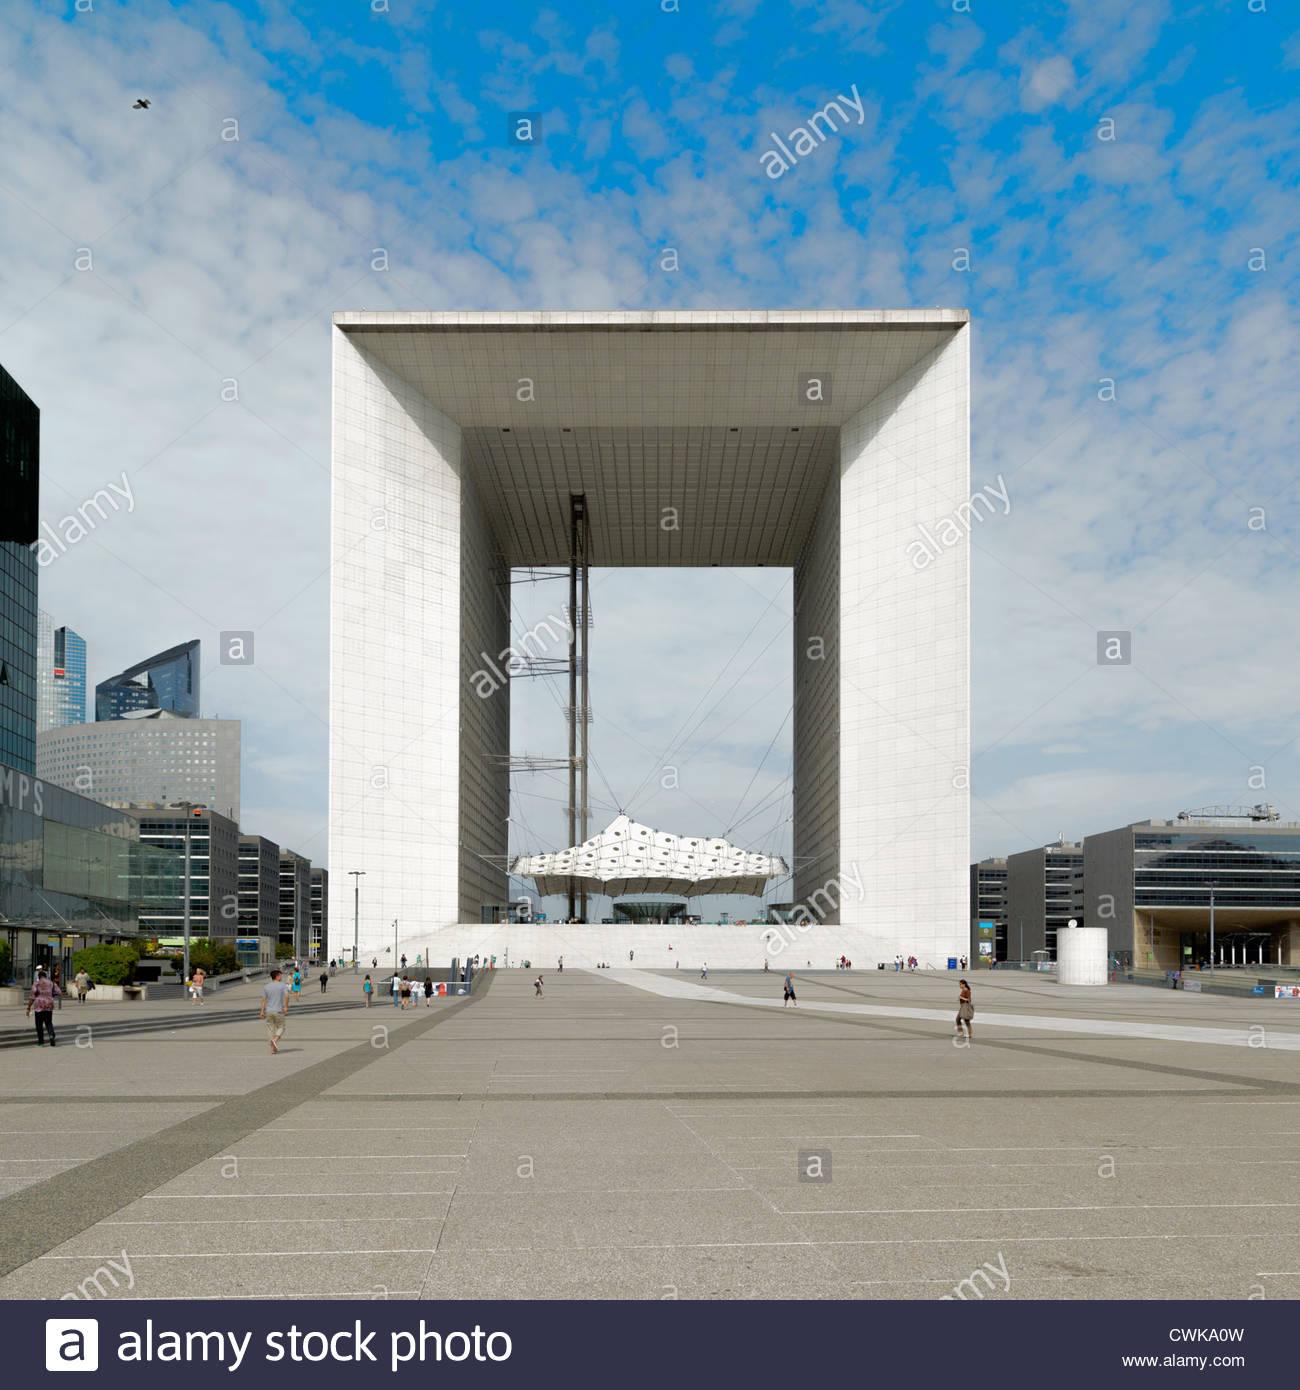 La Grande Arche Designed By Johann Otto Von Spreckelsen And Erik.